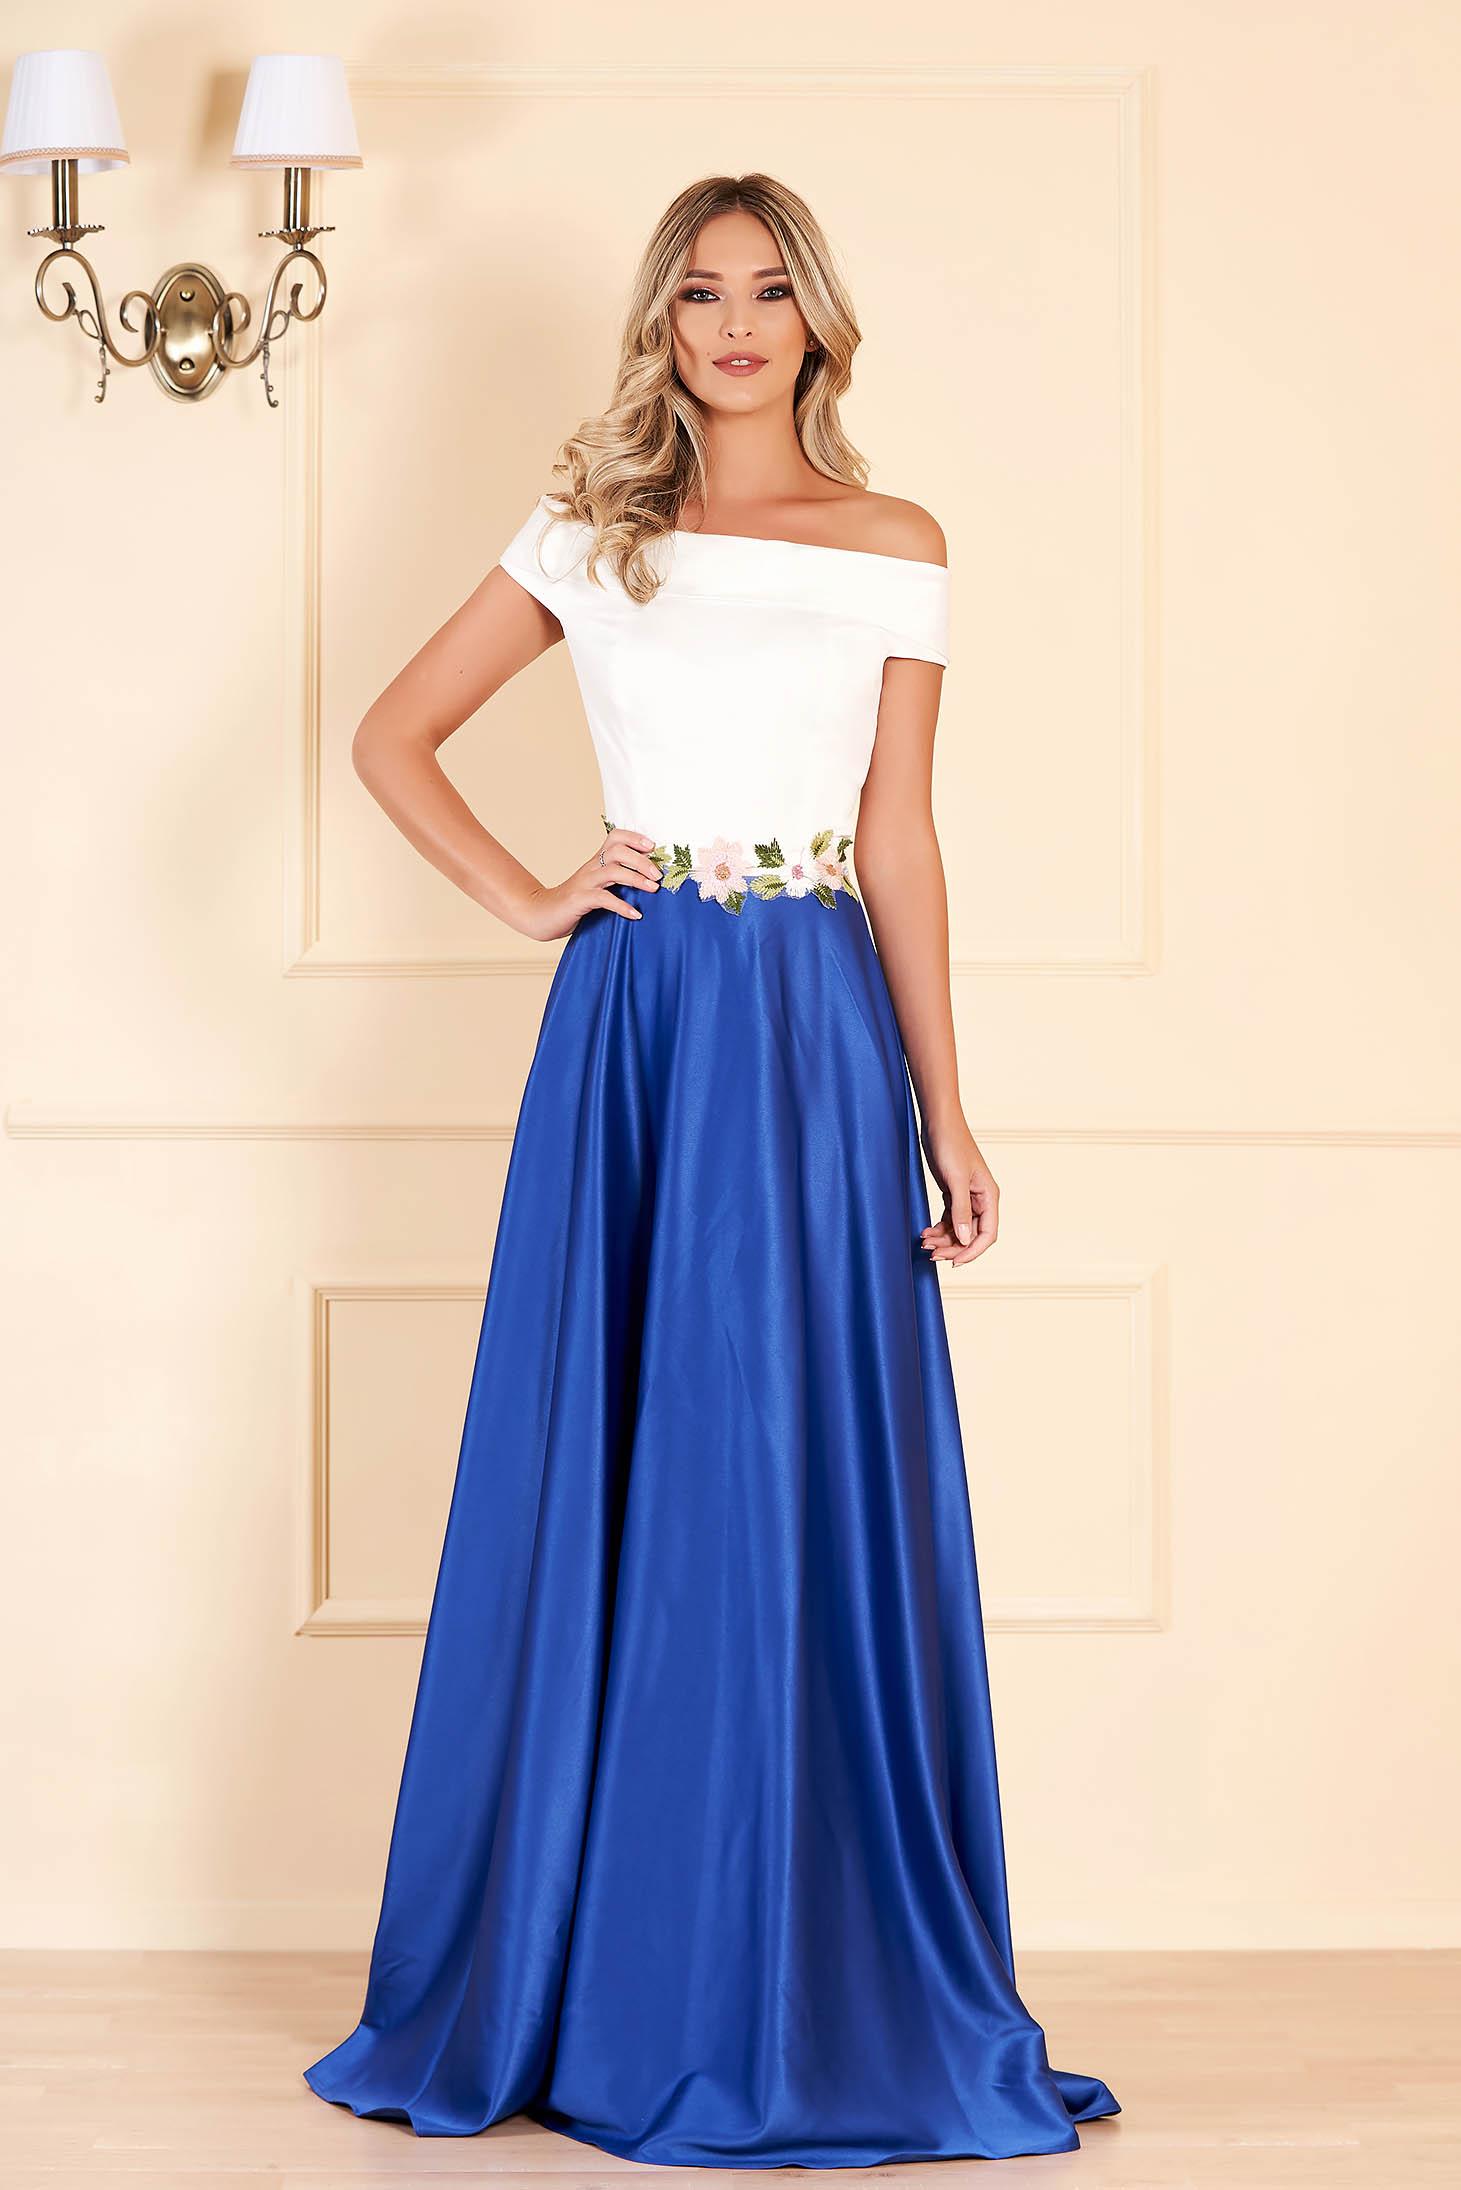 Rochie albastra de ocazie in clos din material satinat cu insertii de broderie